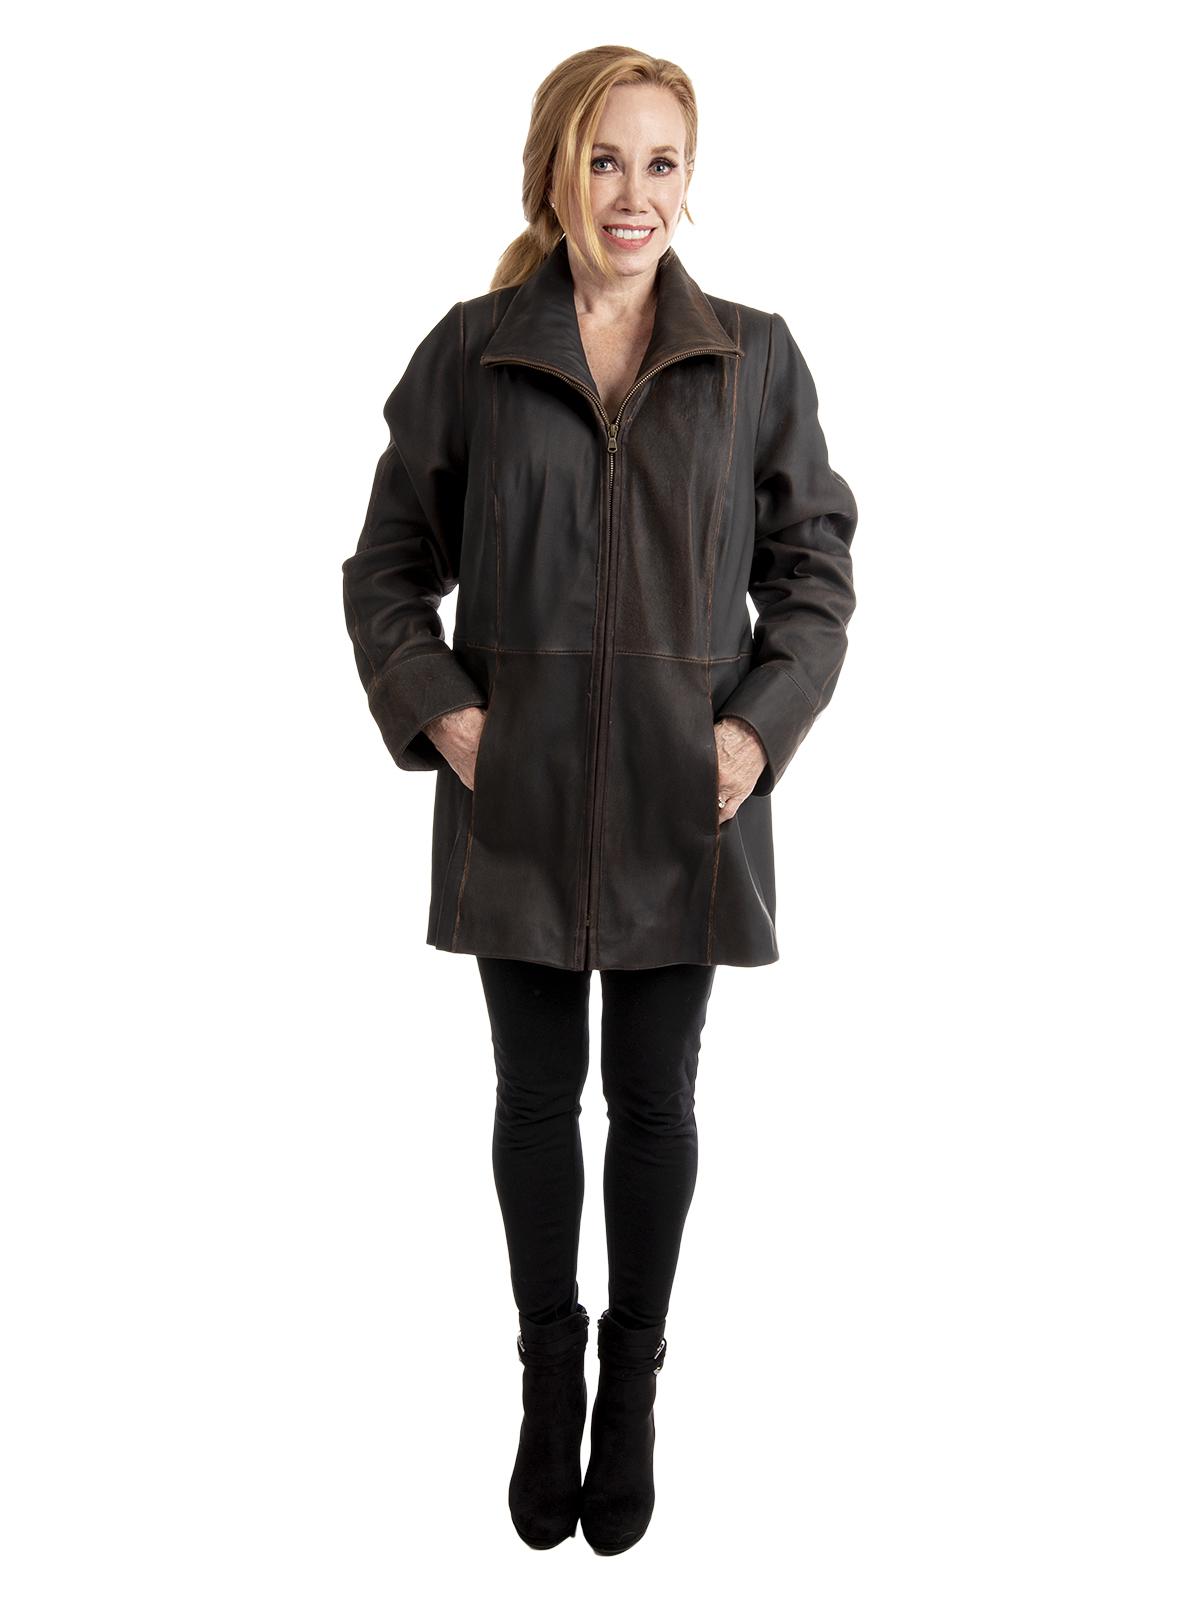 Woman's Cognac Leather Lambskin Zippered Jacket